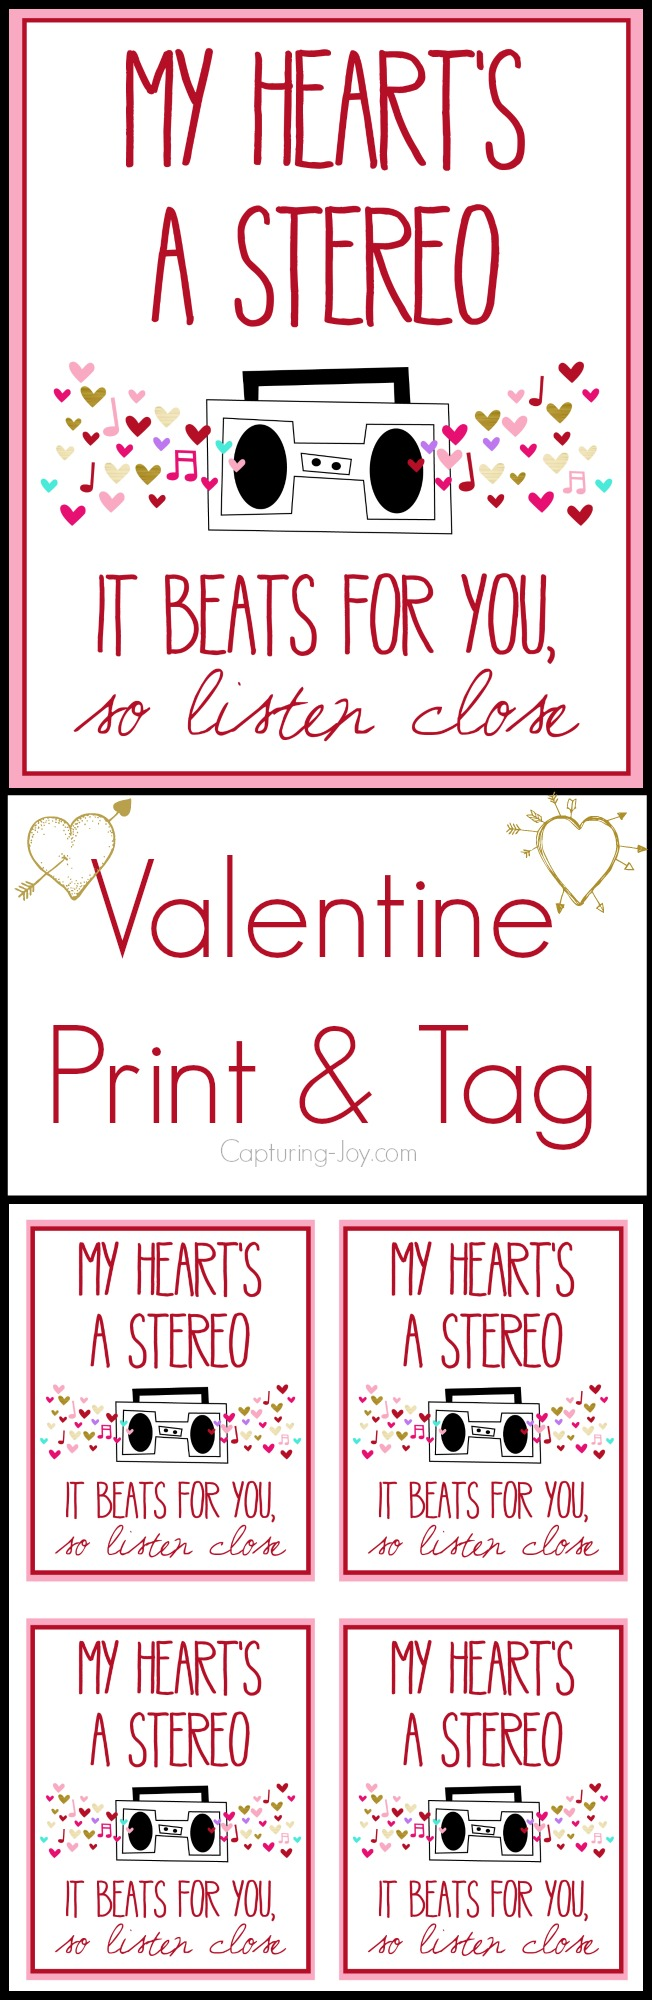 My Heart's a stereo Valentine Print